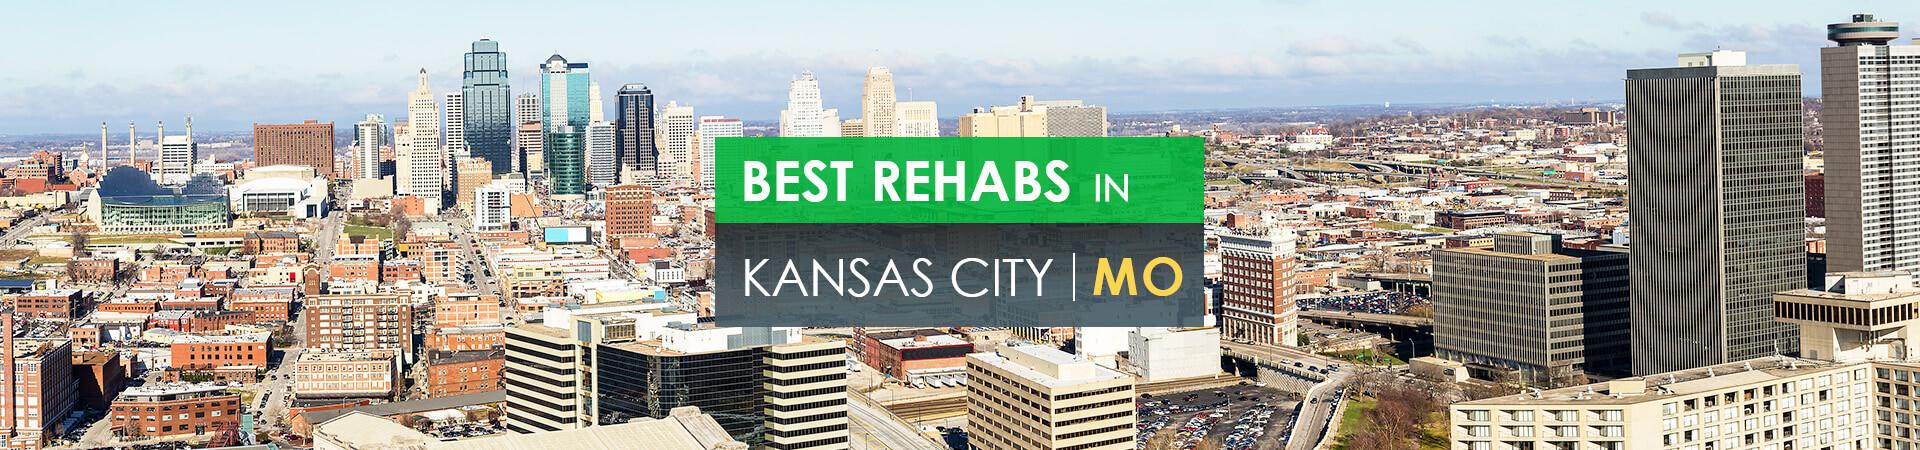 Best rehabs in Kansas City, MO